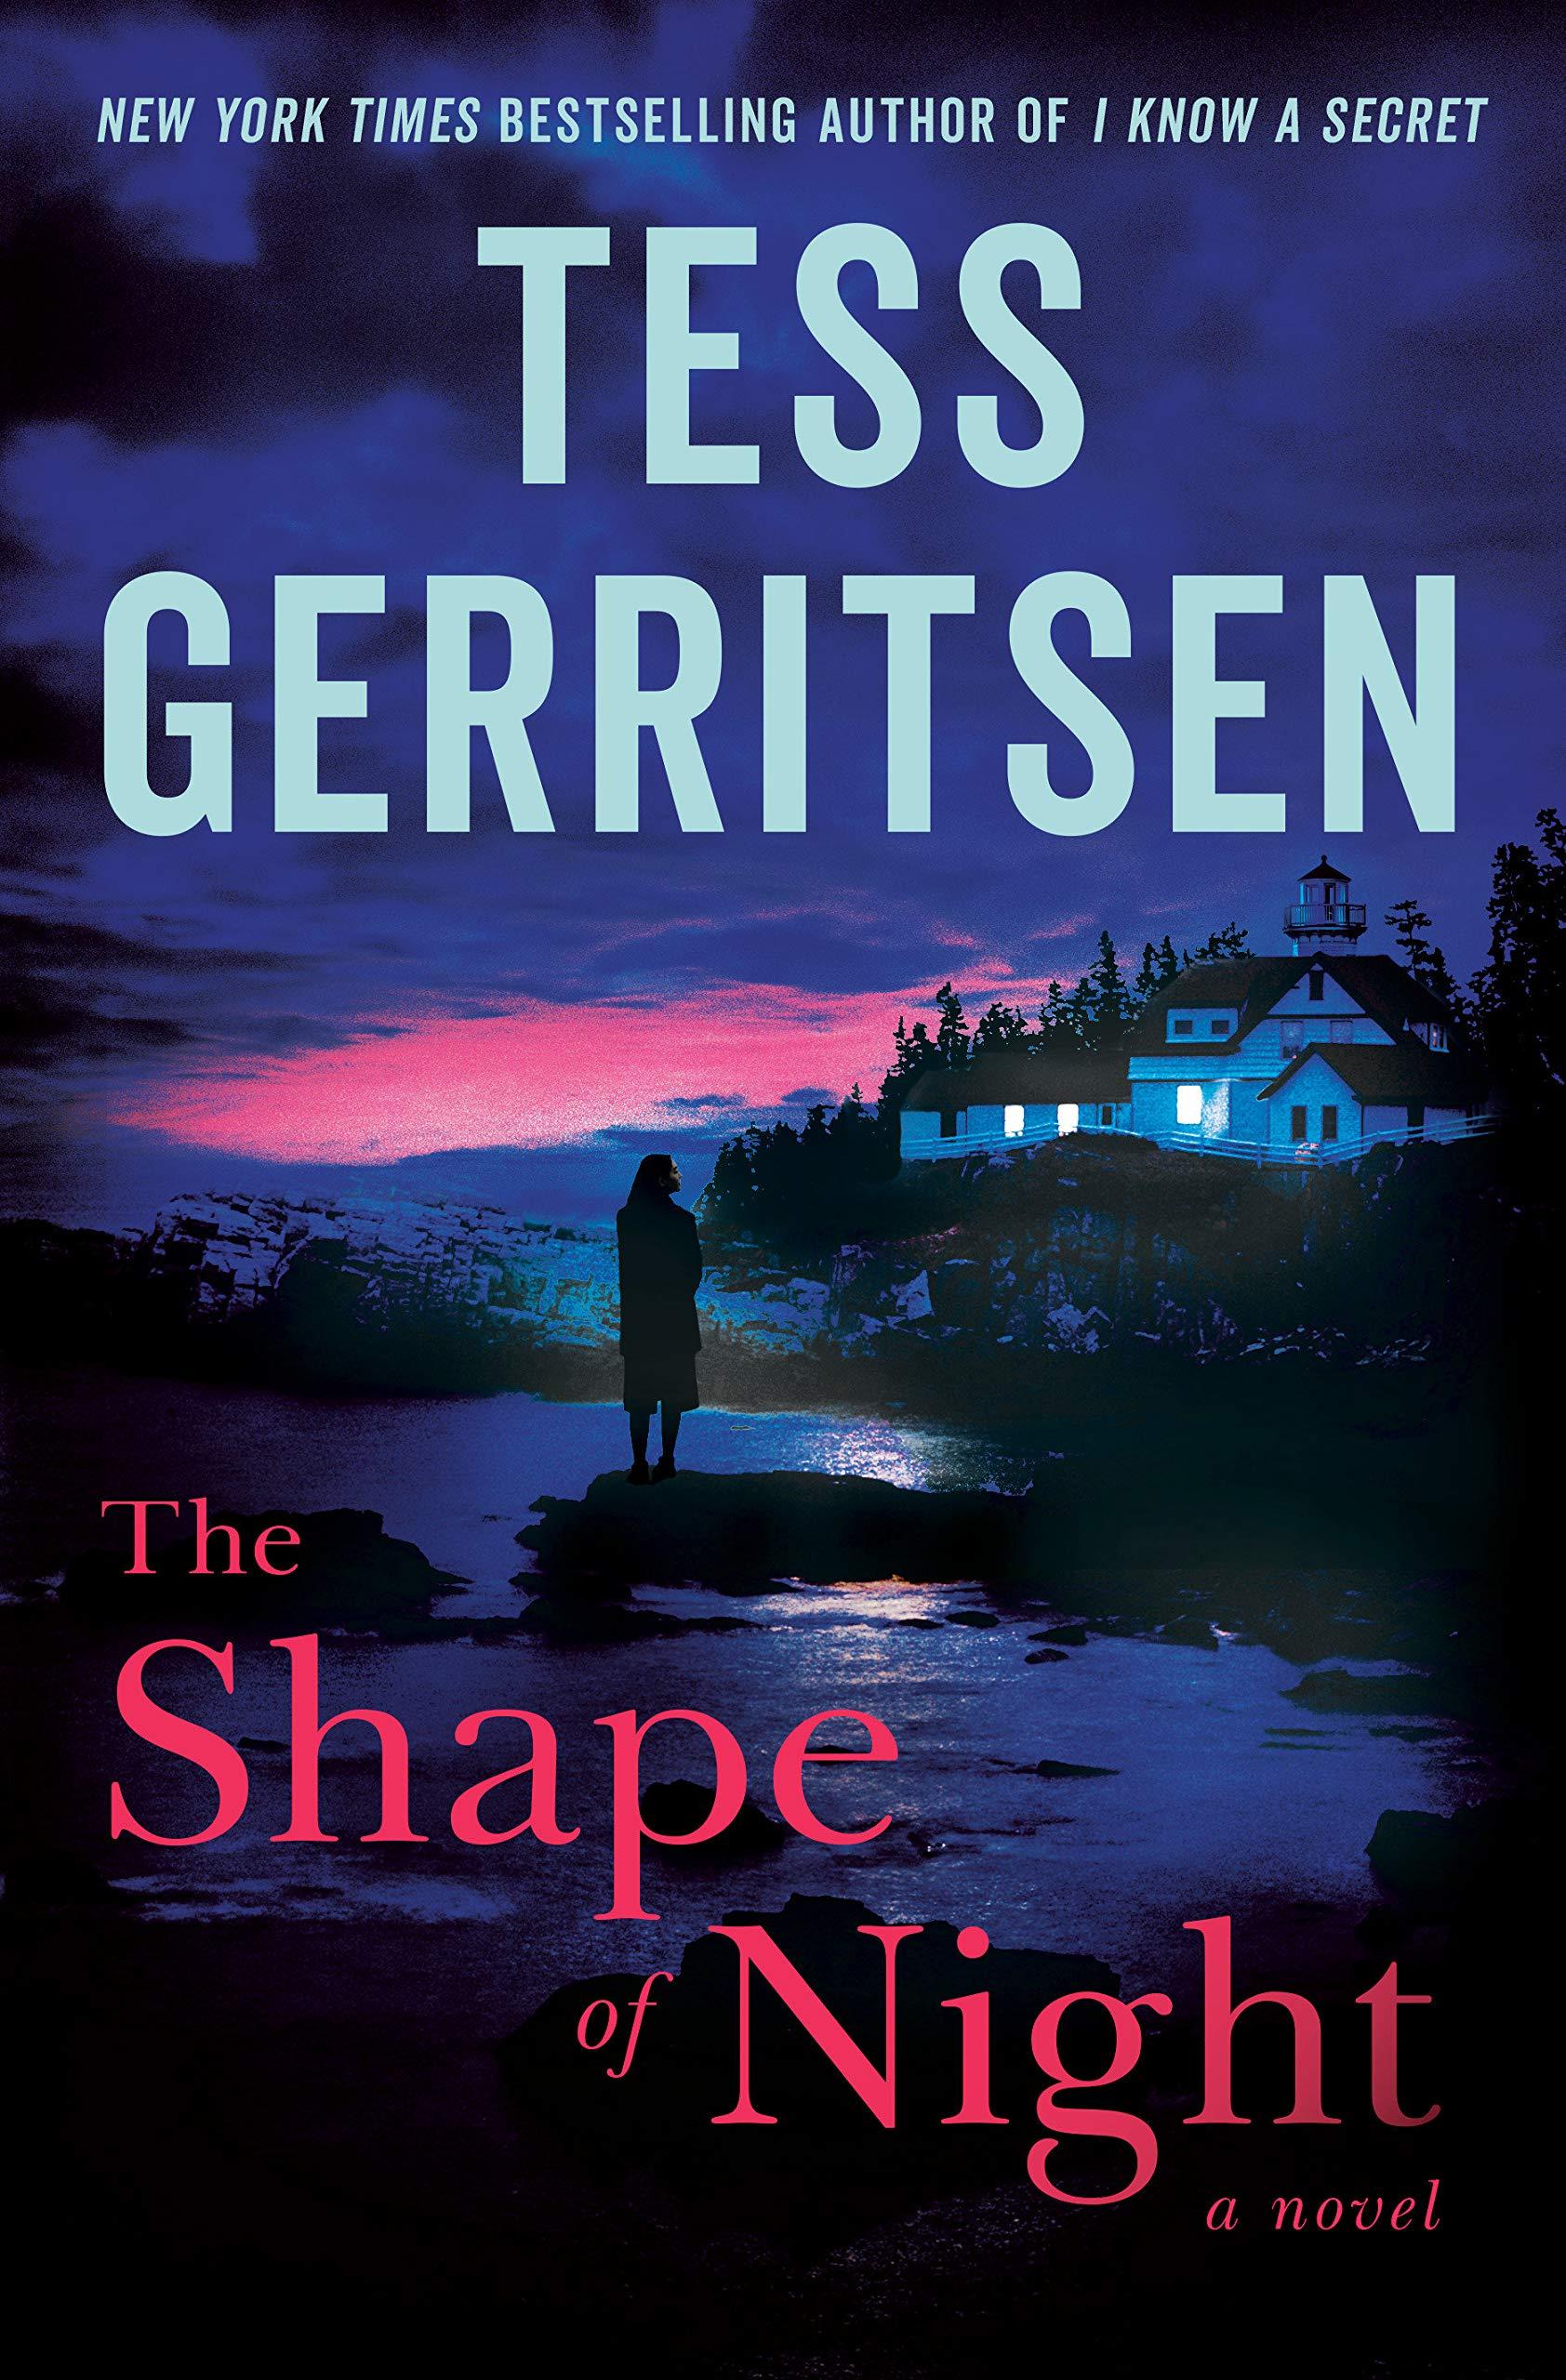 The Shape of Night: A Novel by Ballantine Books